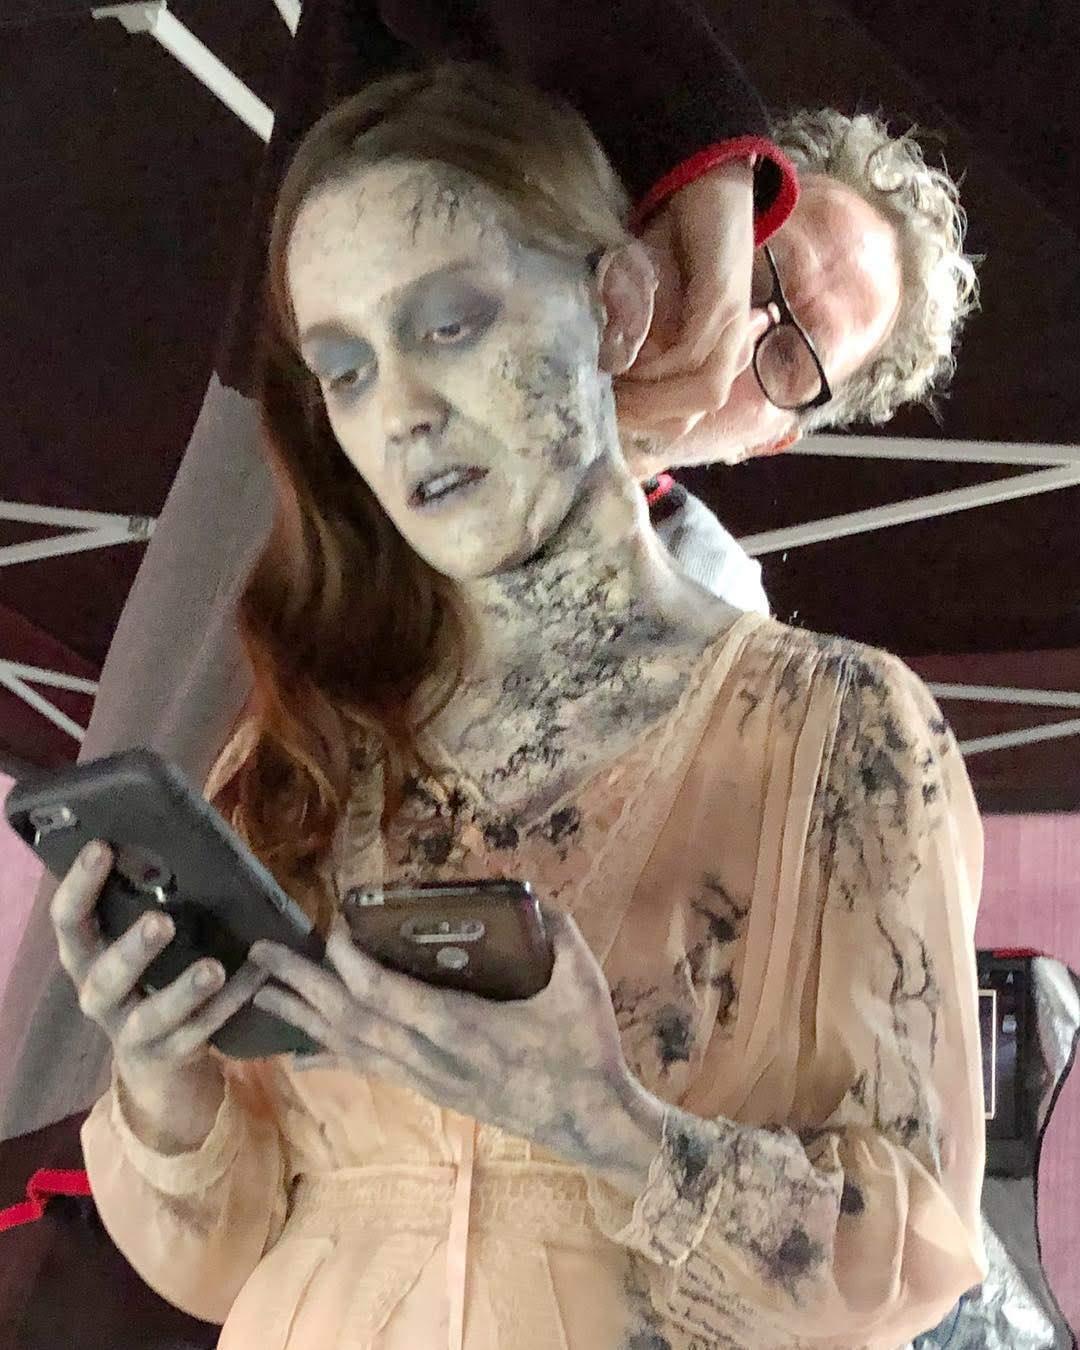 Victoria Pedretti Looks Like a Social Media Zombie : SNS 依存症のソーシャル・メディア・ゾンビみたいな注目の新人女優のヴィクトリア・ペドレッティ ! !